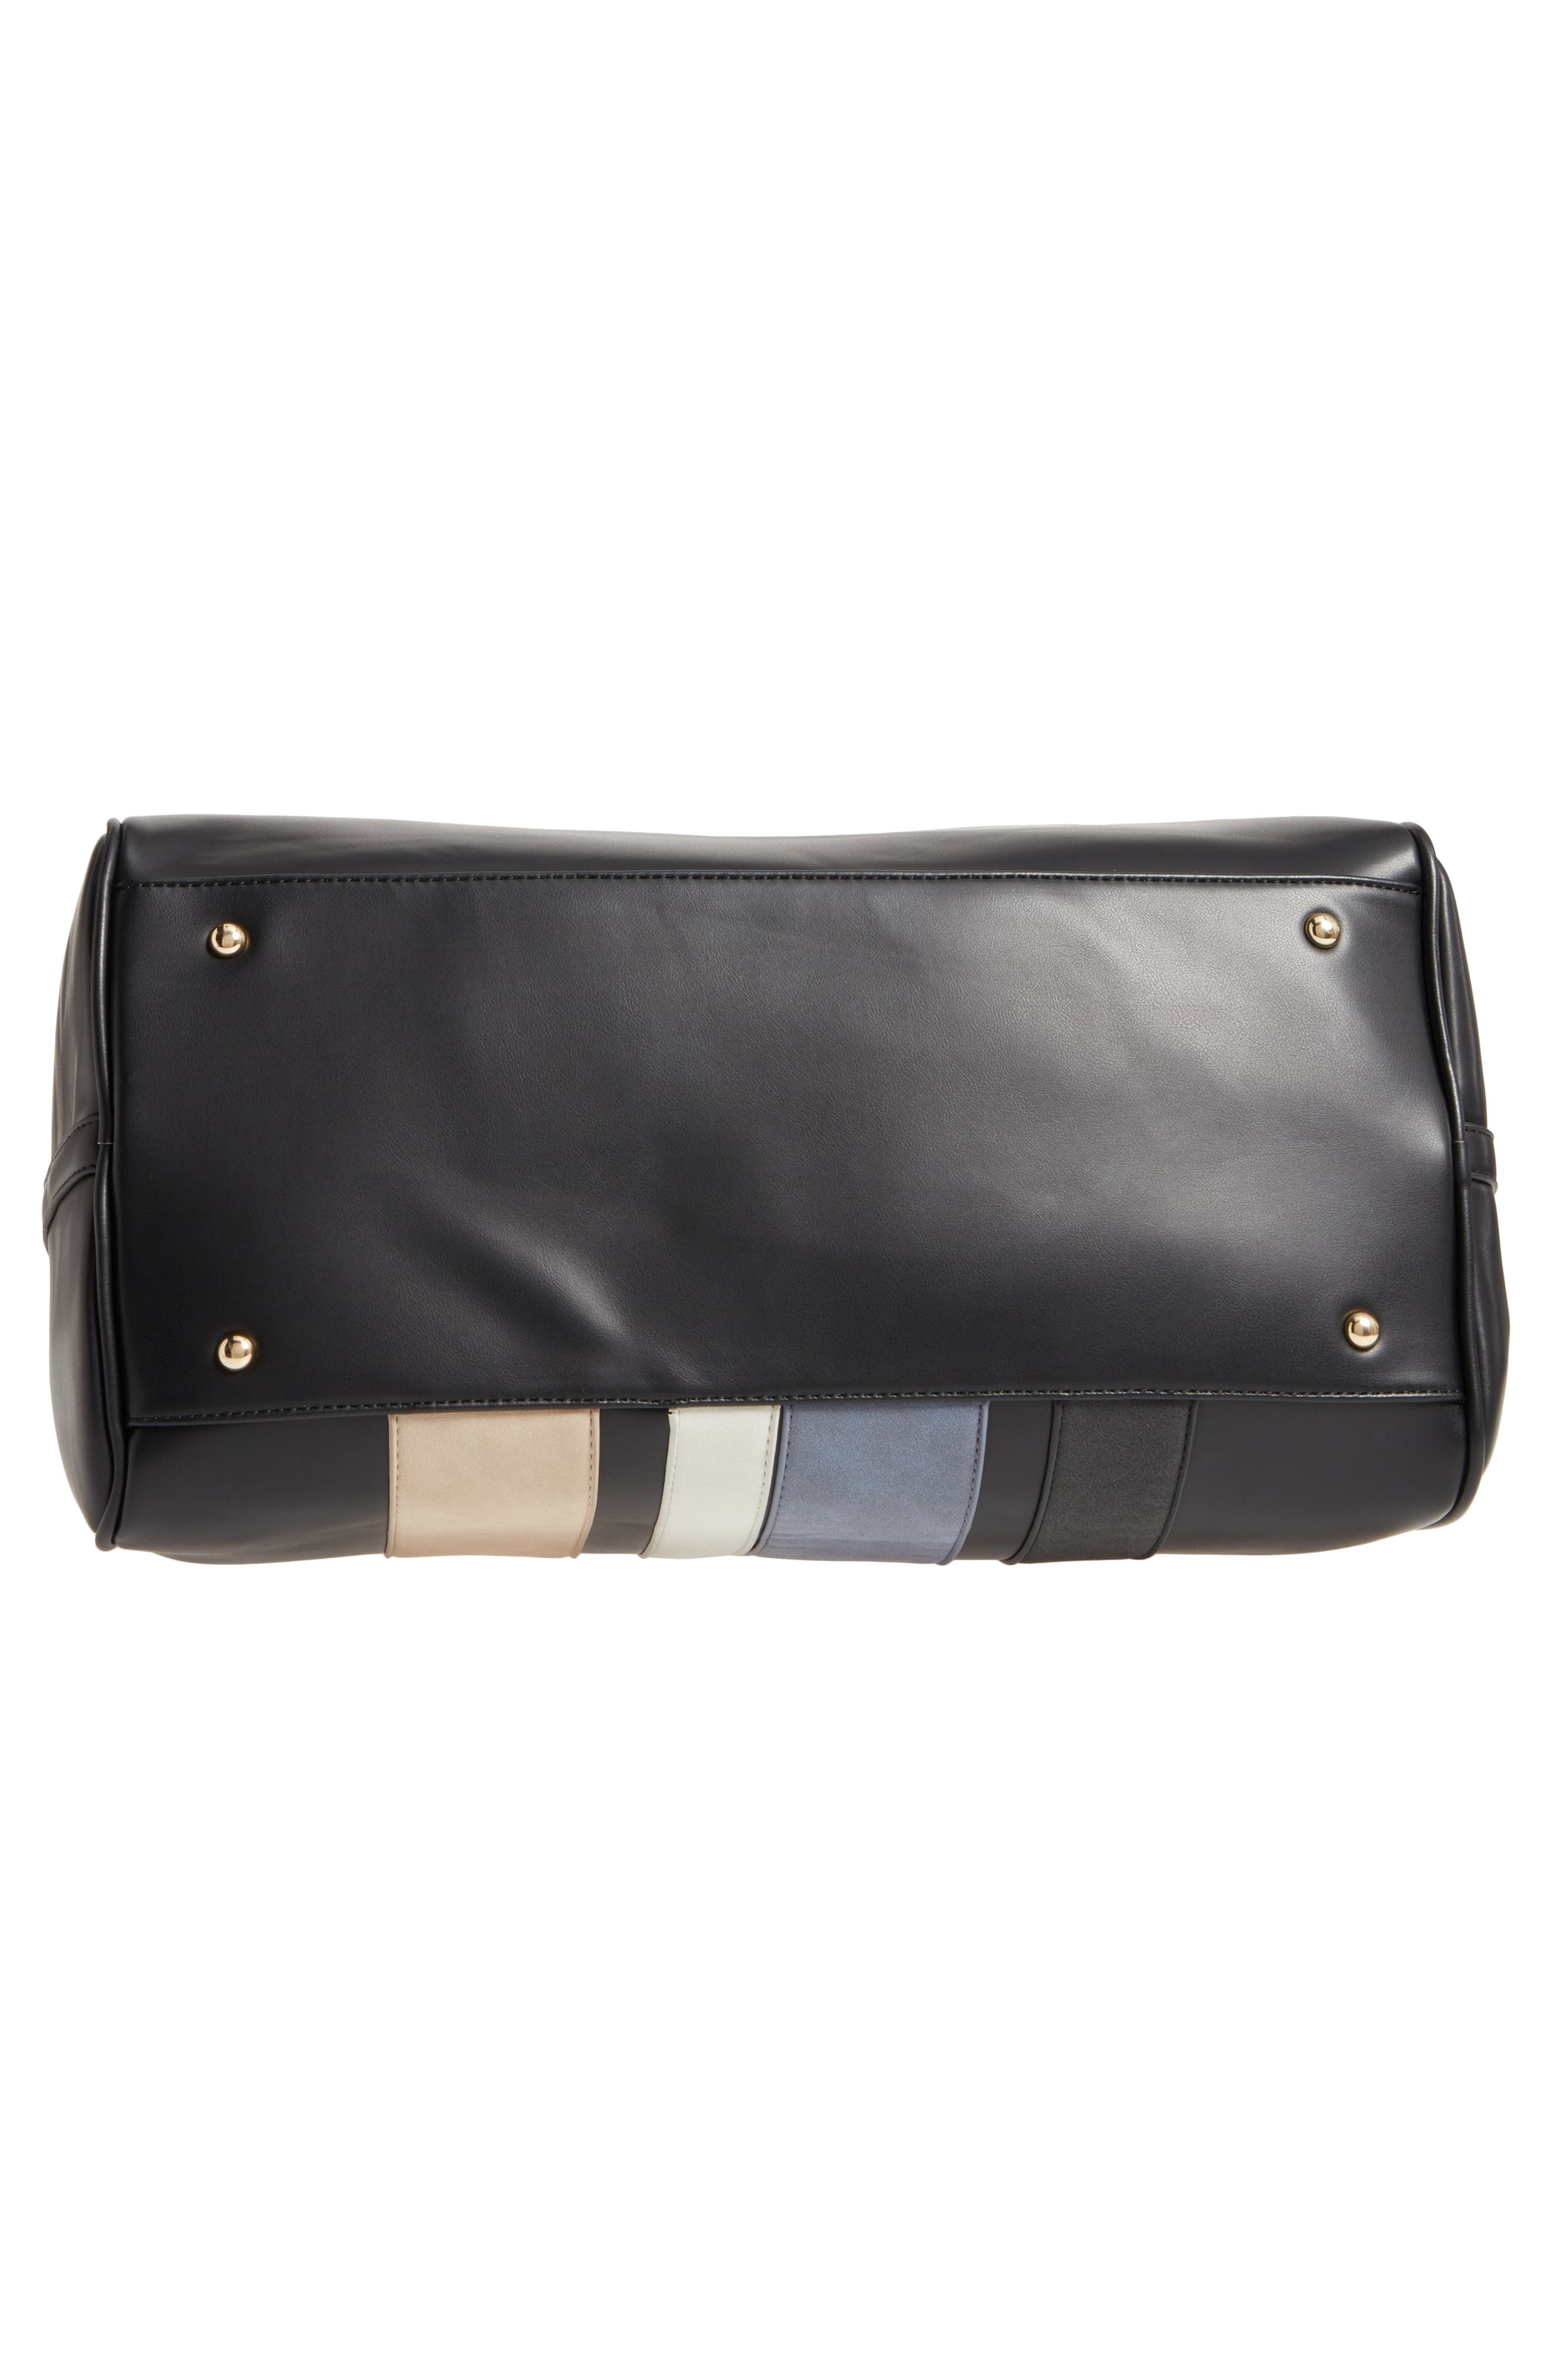 Stripe Faux Leather Duffel Bag,                             Alternate thumbnail 6, color,                             001